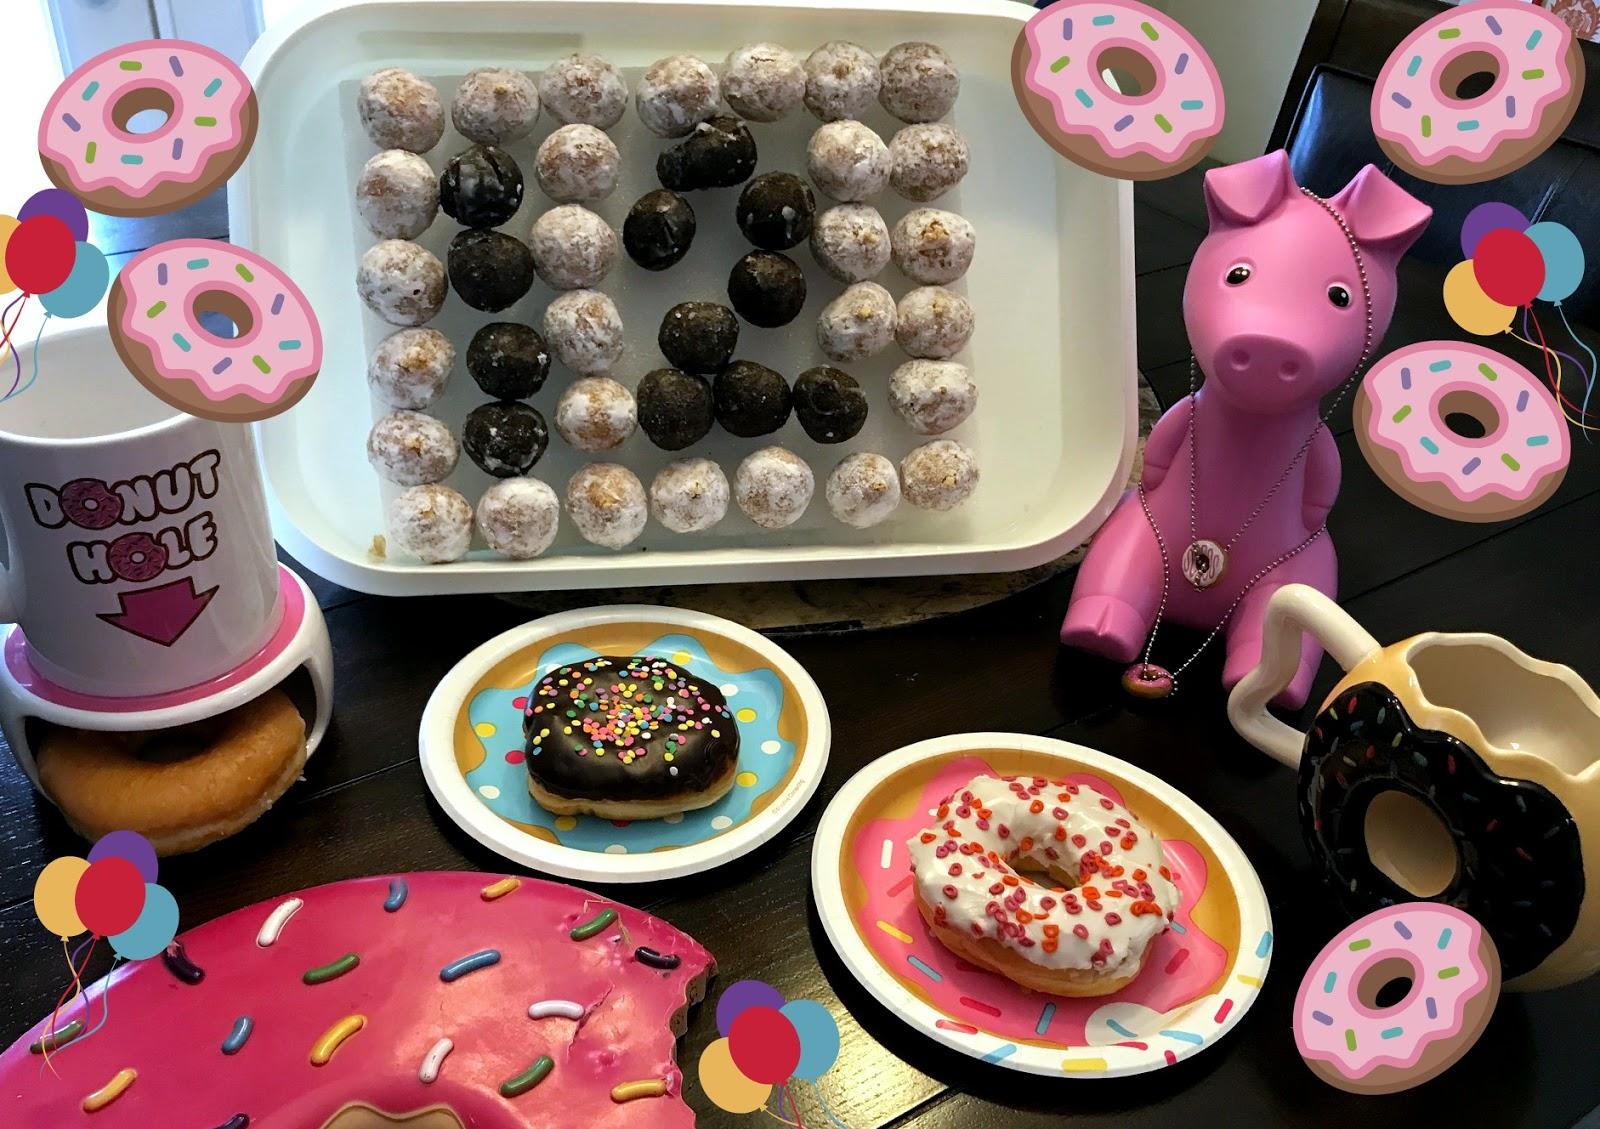 national donut day - photo #22